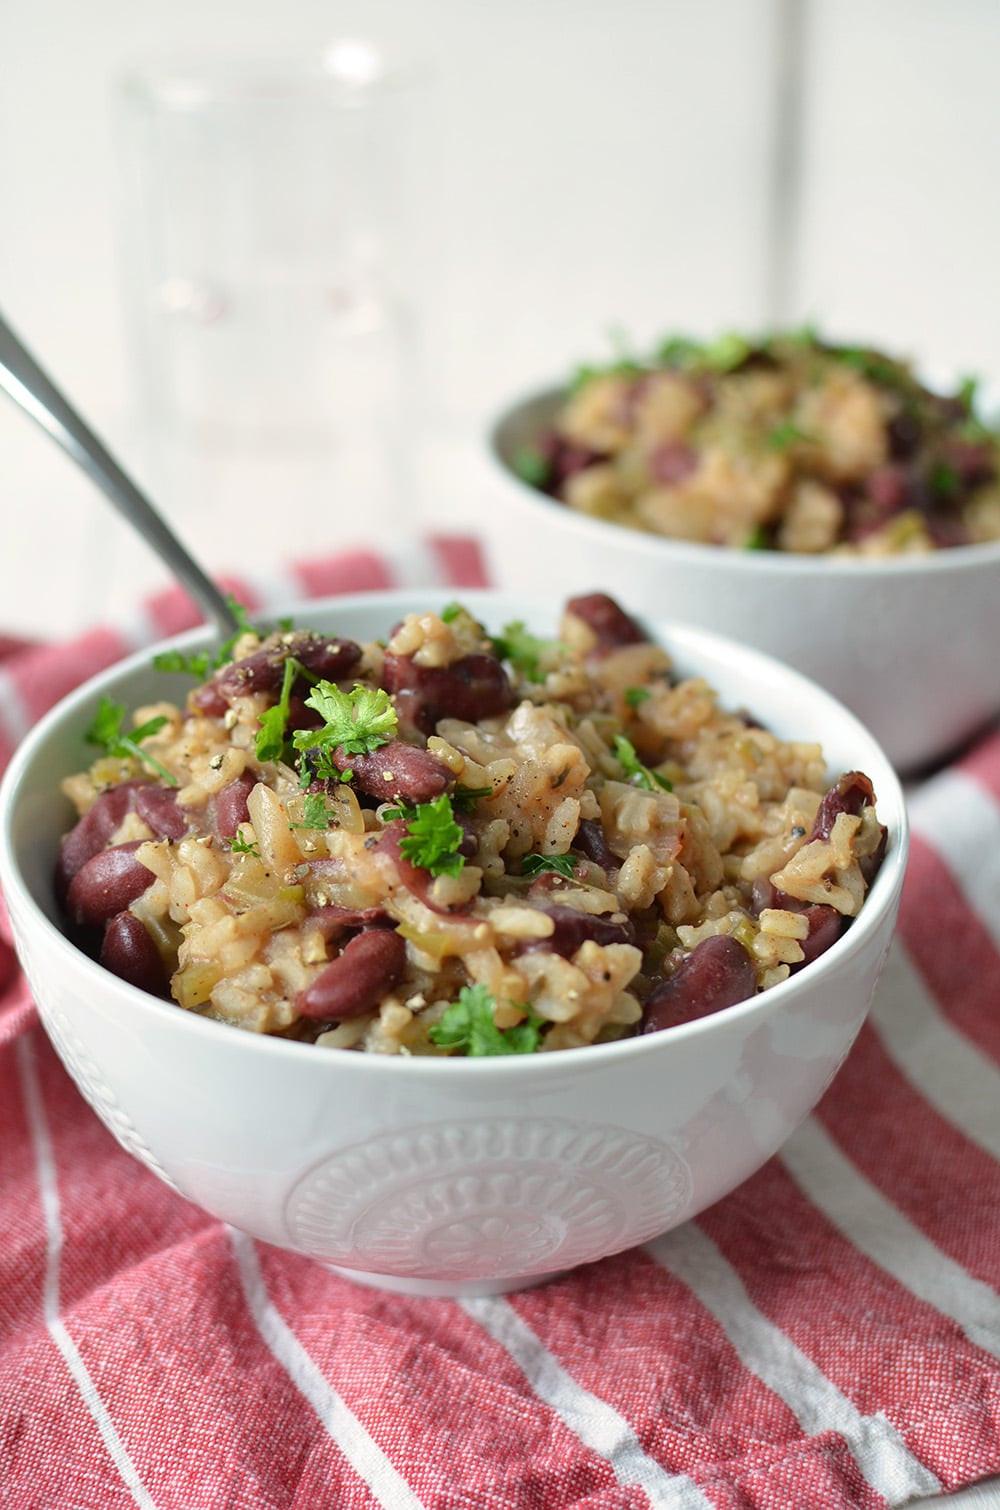 Vegetarian Rice And Bean Recipes  Slow Cooker Vegan Bean and Rice Recipe